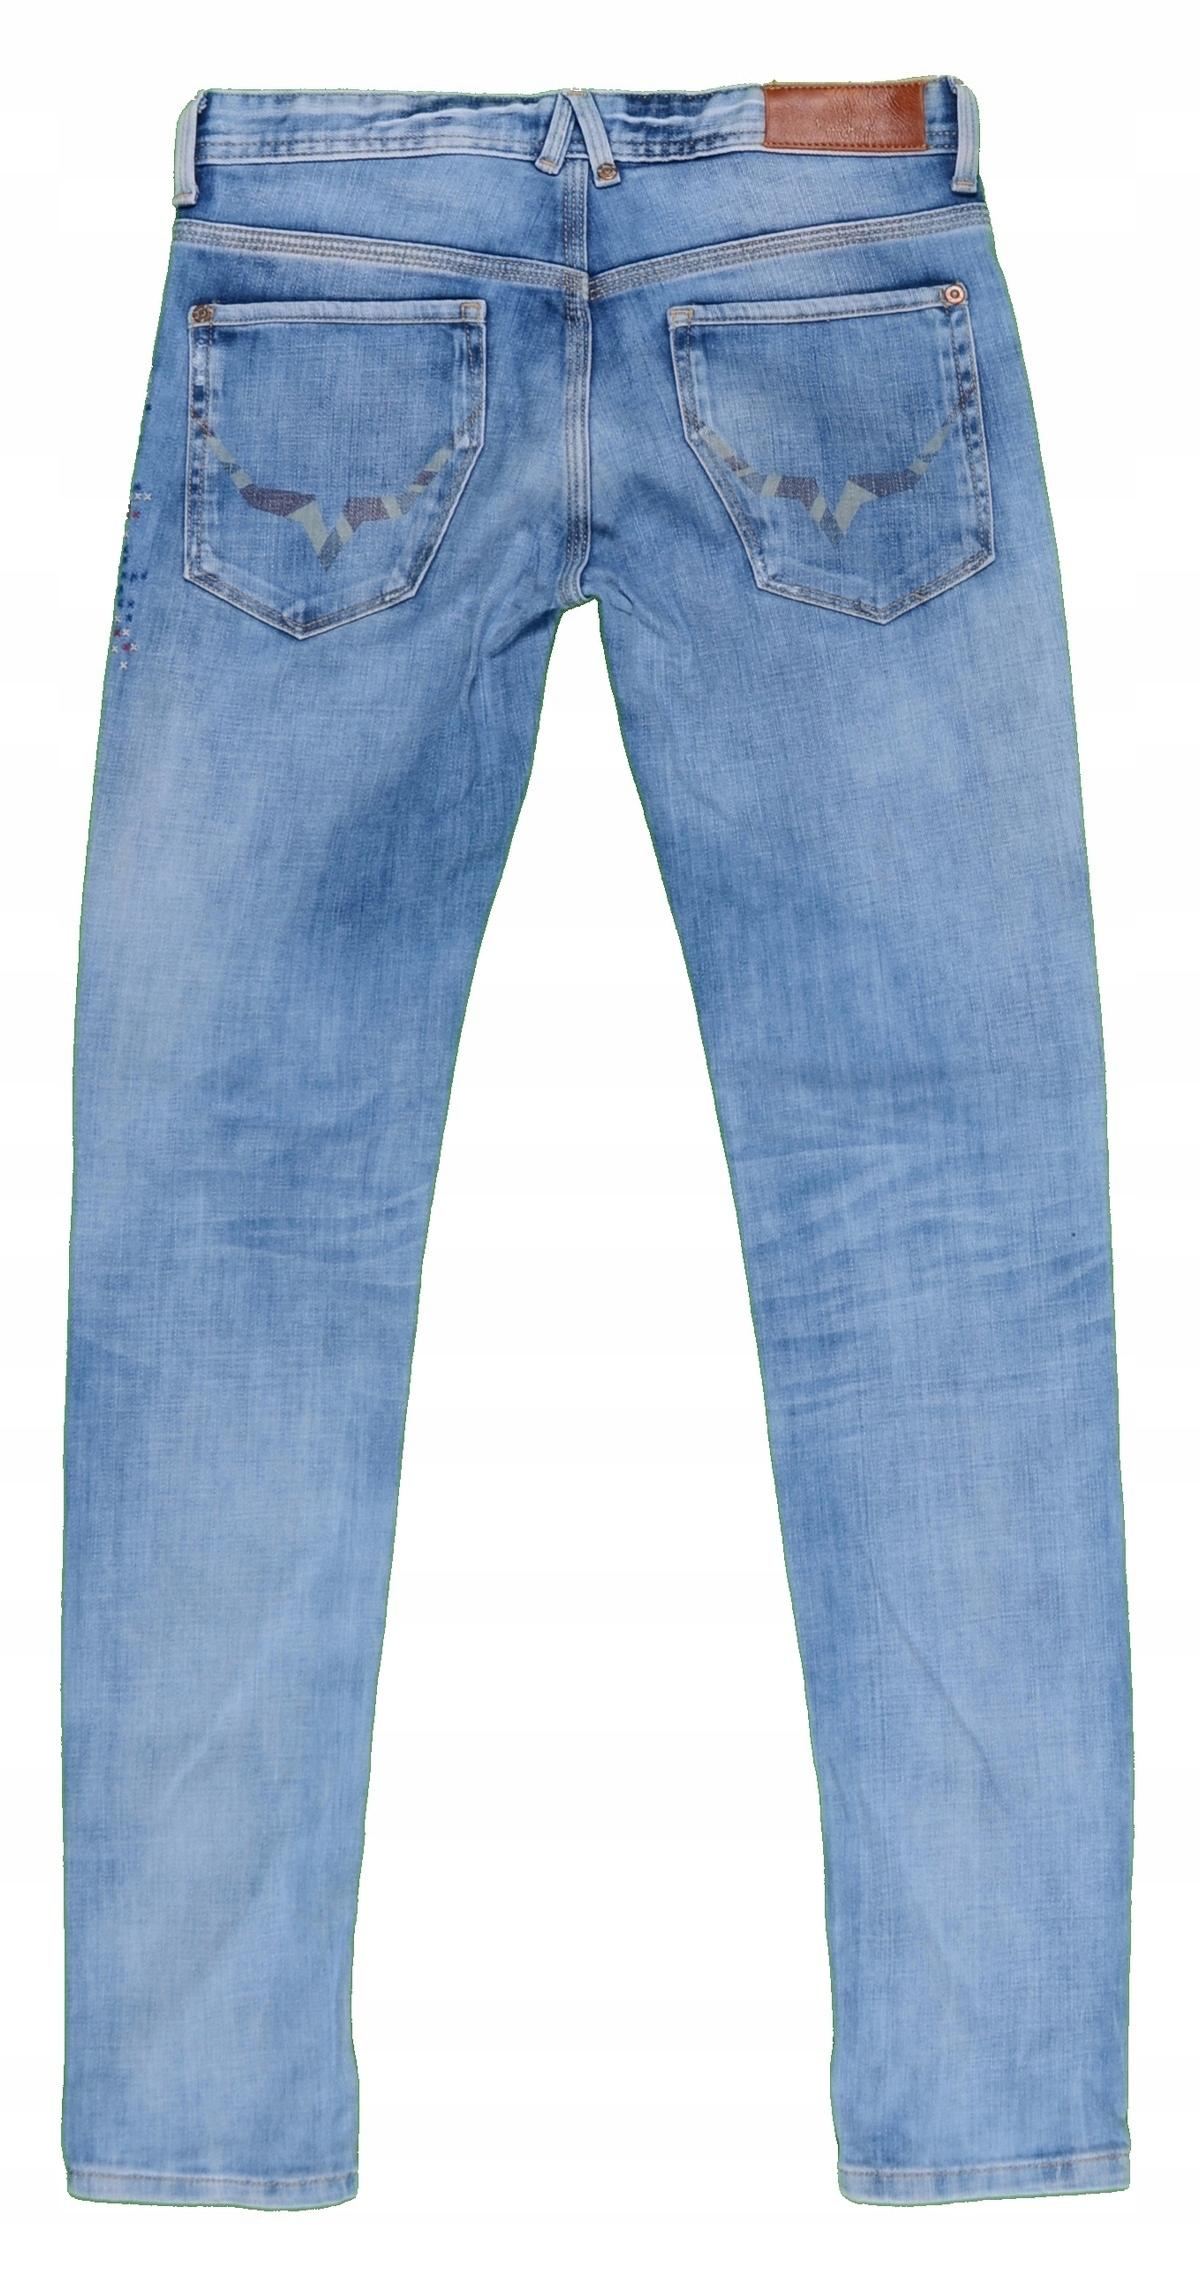 adac54e3df2cfc PEPE JEANS jeansy ze streczem rurki r. 36 MISIZM - 7539792461 ...